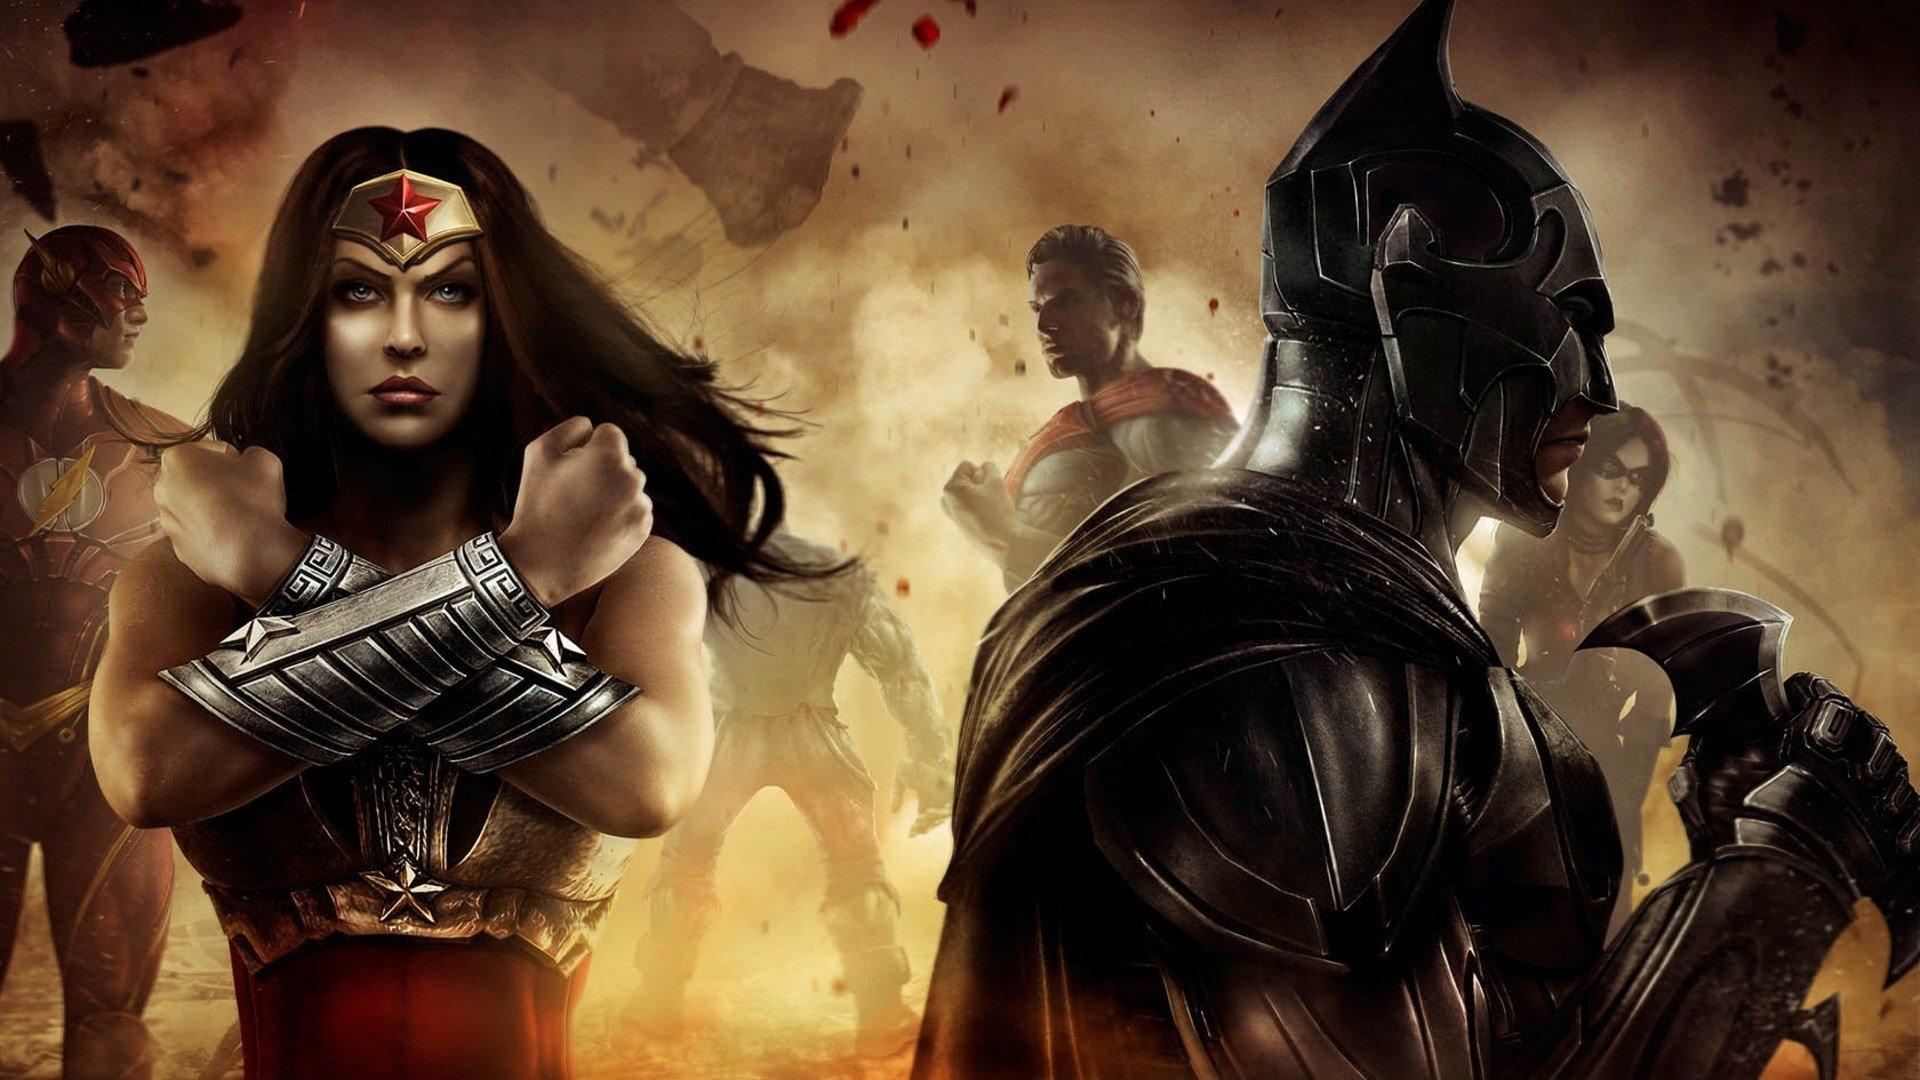 Injustice Gods Among Us Wallpapers Hd For Desktop Backgrounds